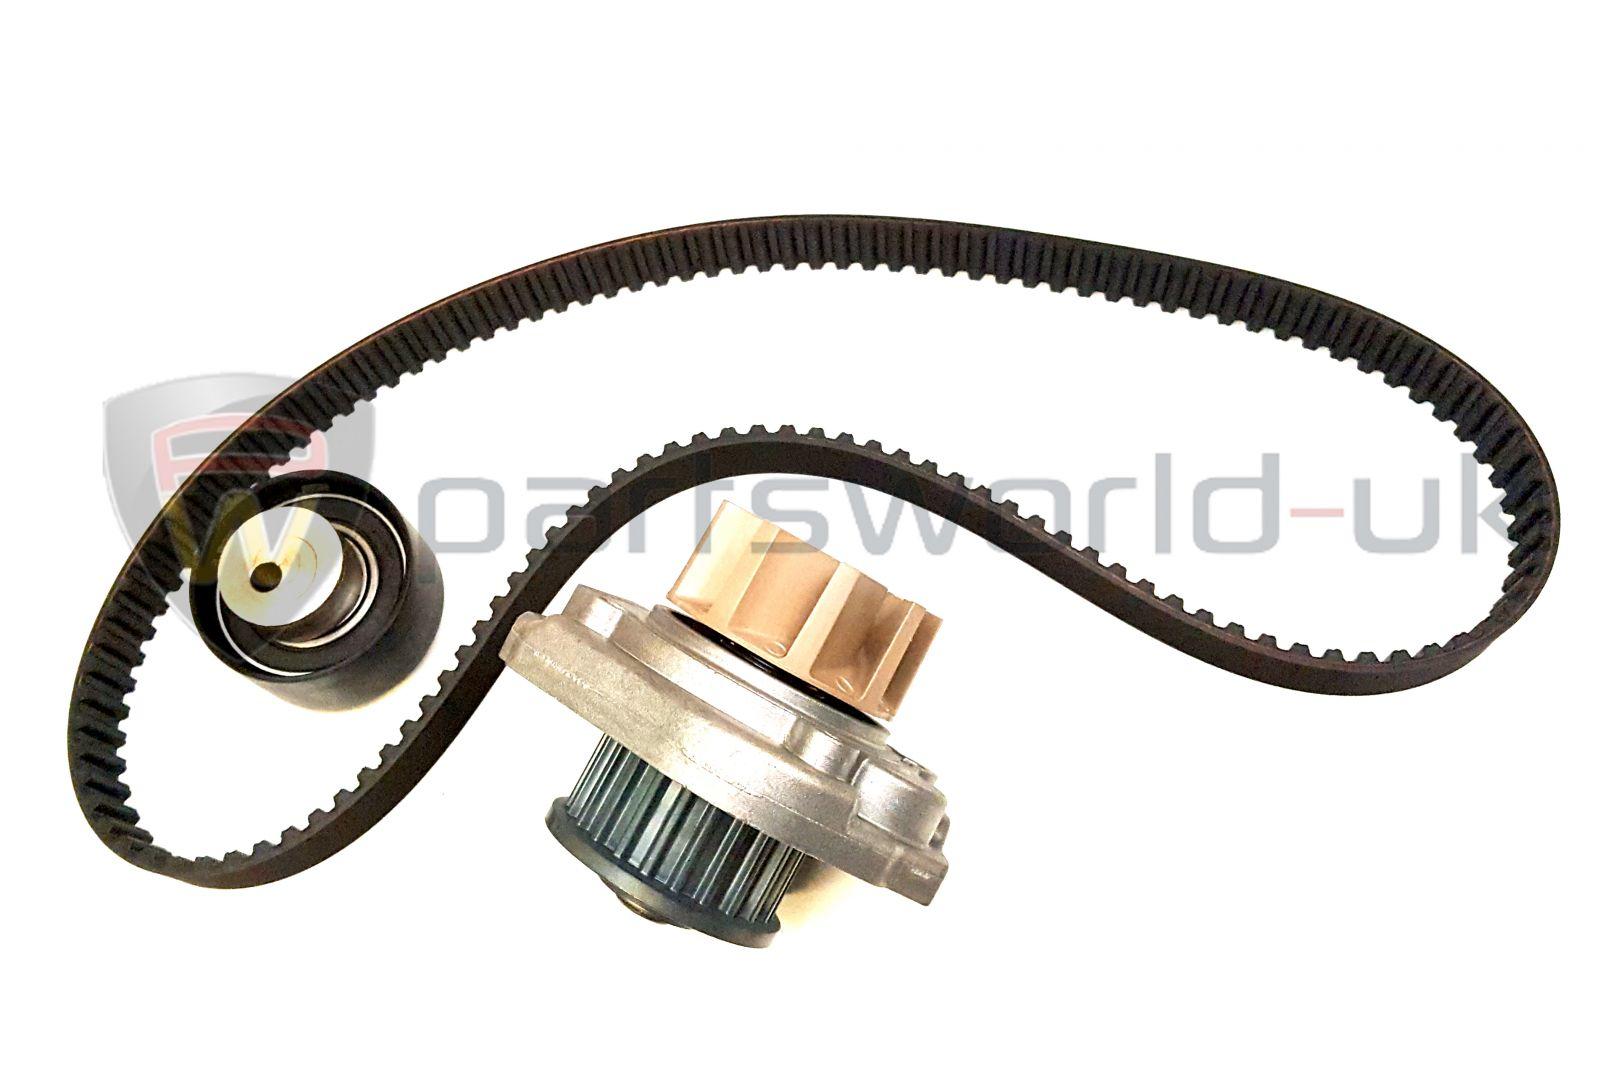 Fiat Timing Belt Auto Electrical Wiring Diagram Viair Relay 40043 4 00p Portable Compressor Abarth Water Pump U0026 Cam Tensioner